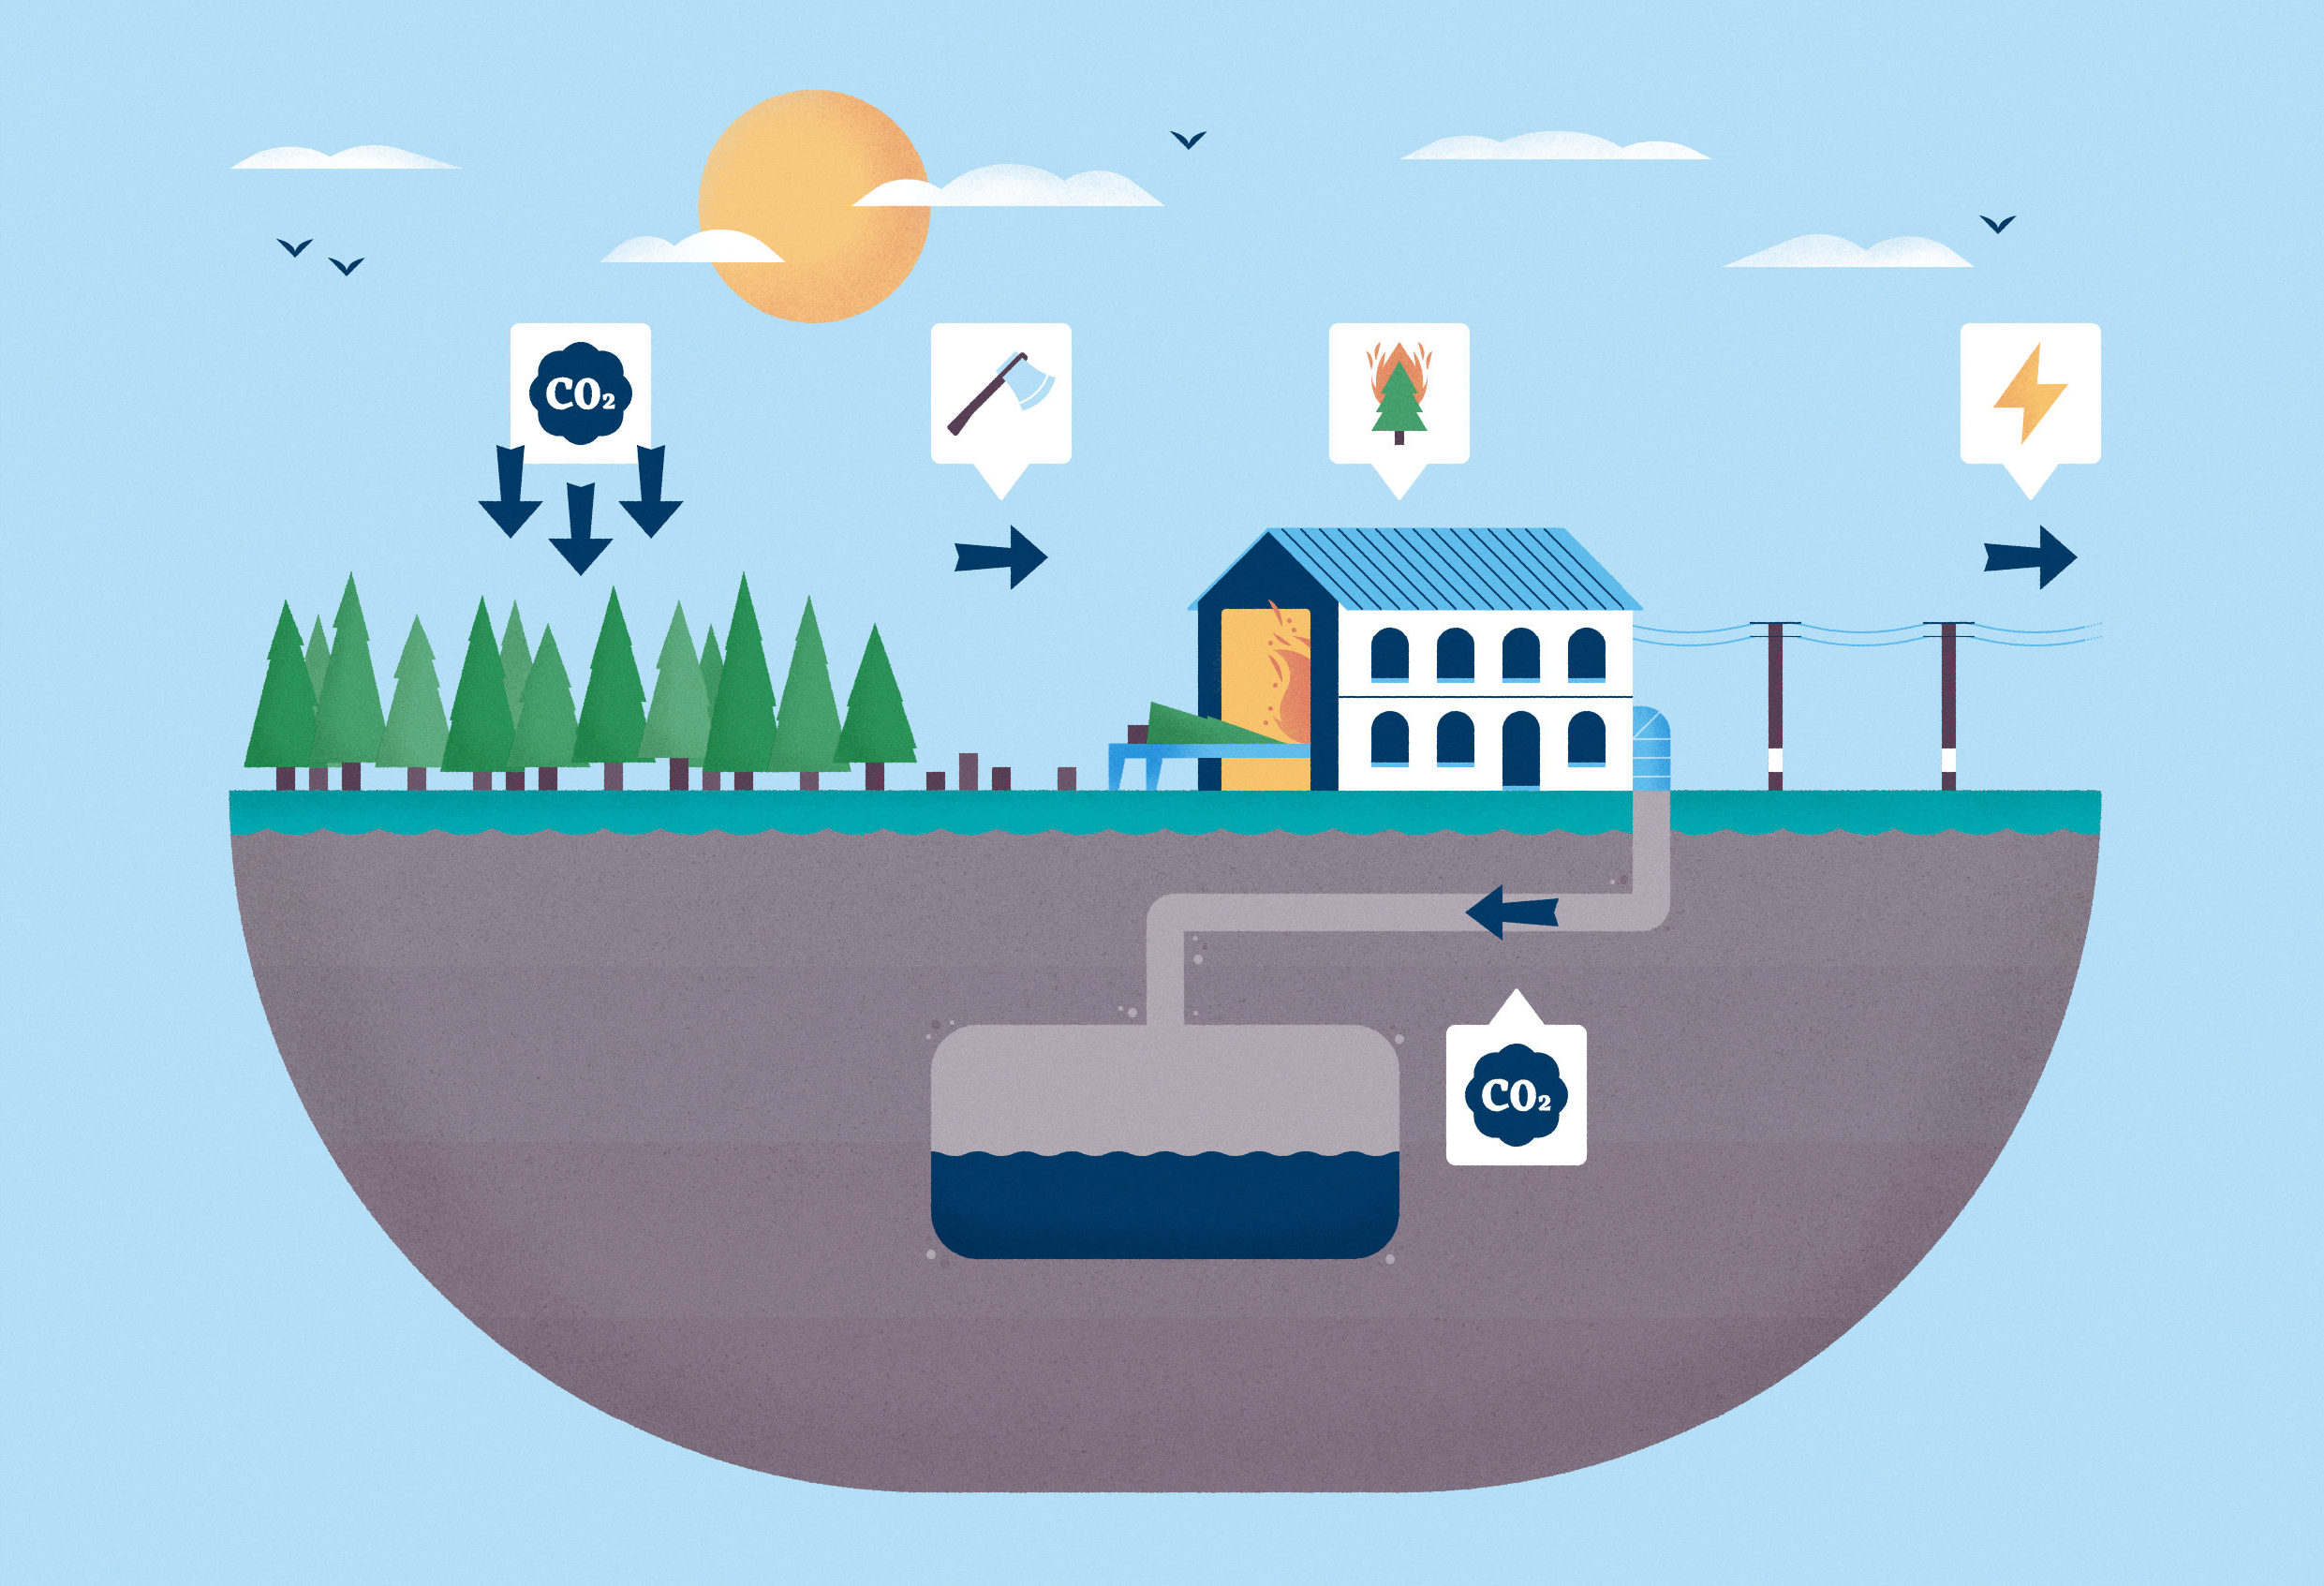 BECCS bioenergy carbon capture storage china dialogue geoengineering